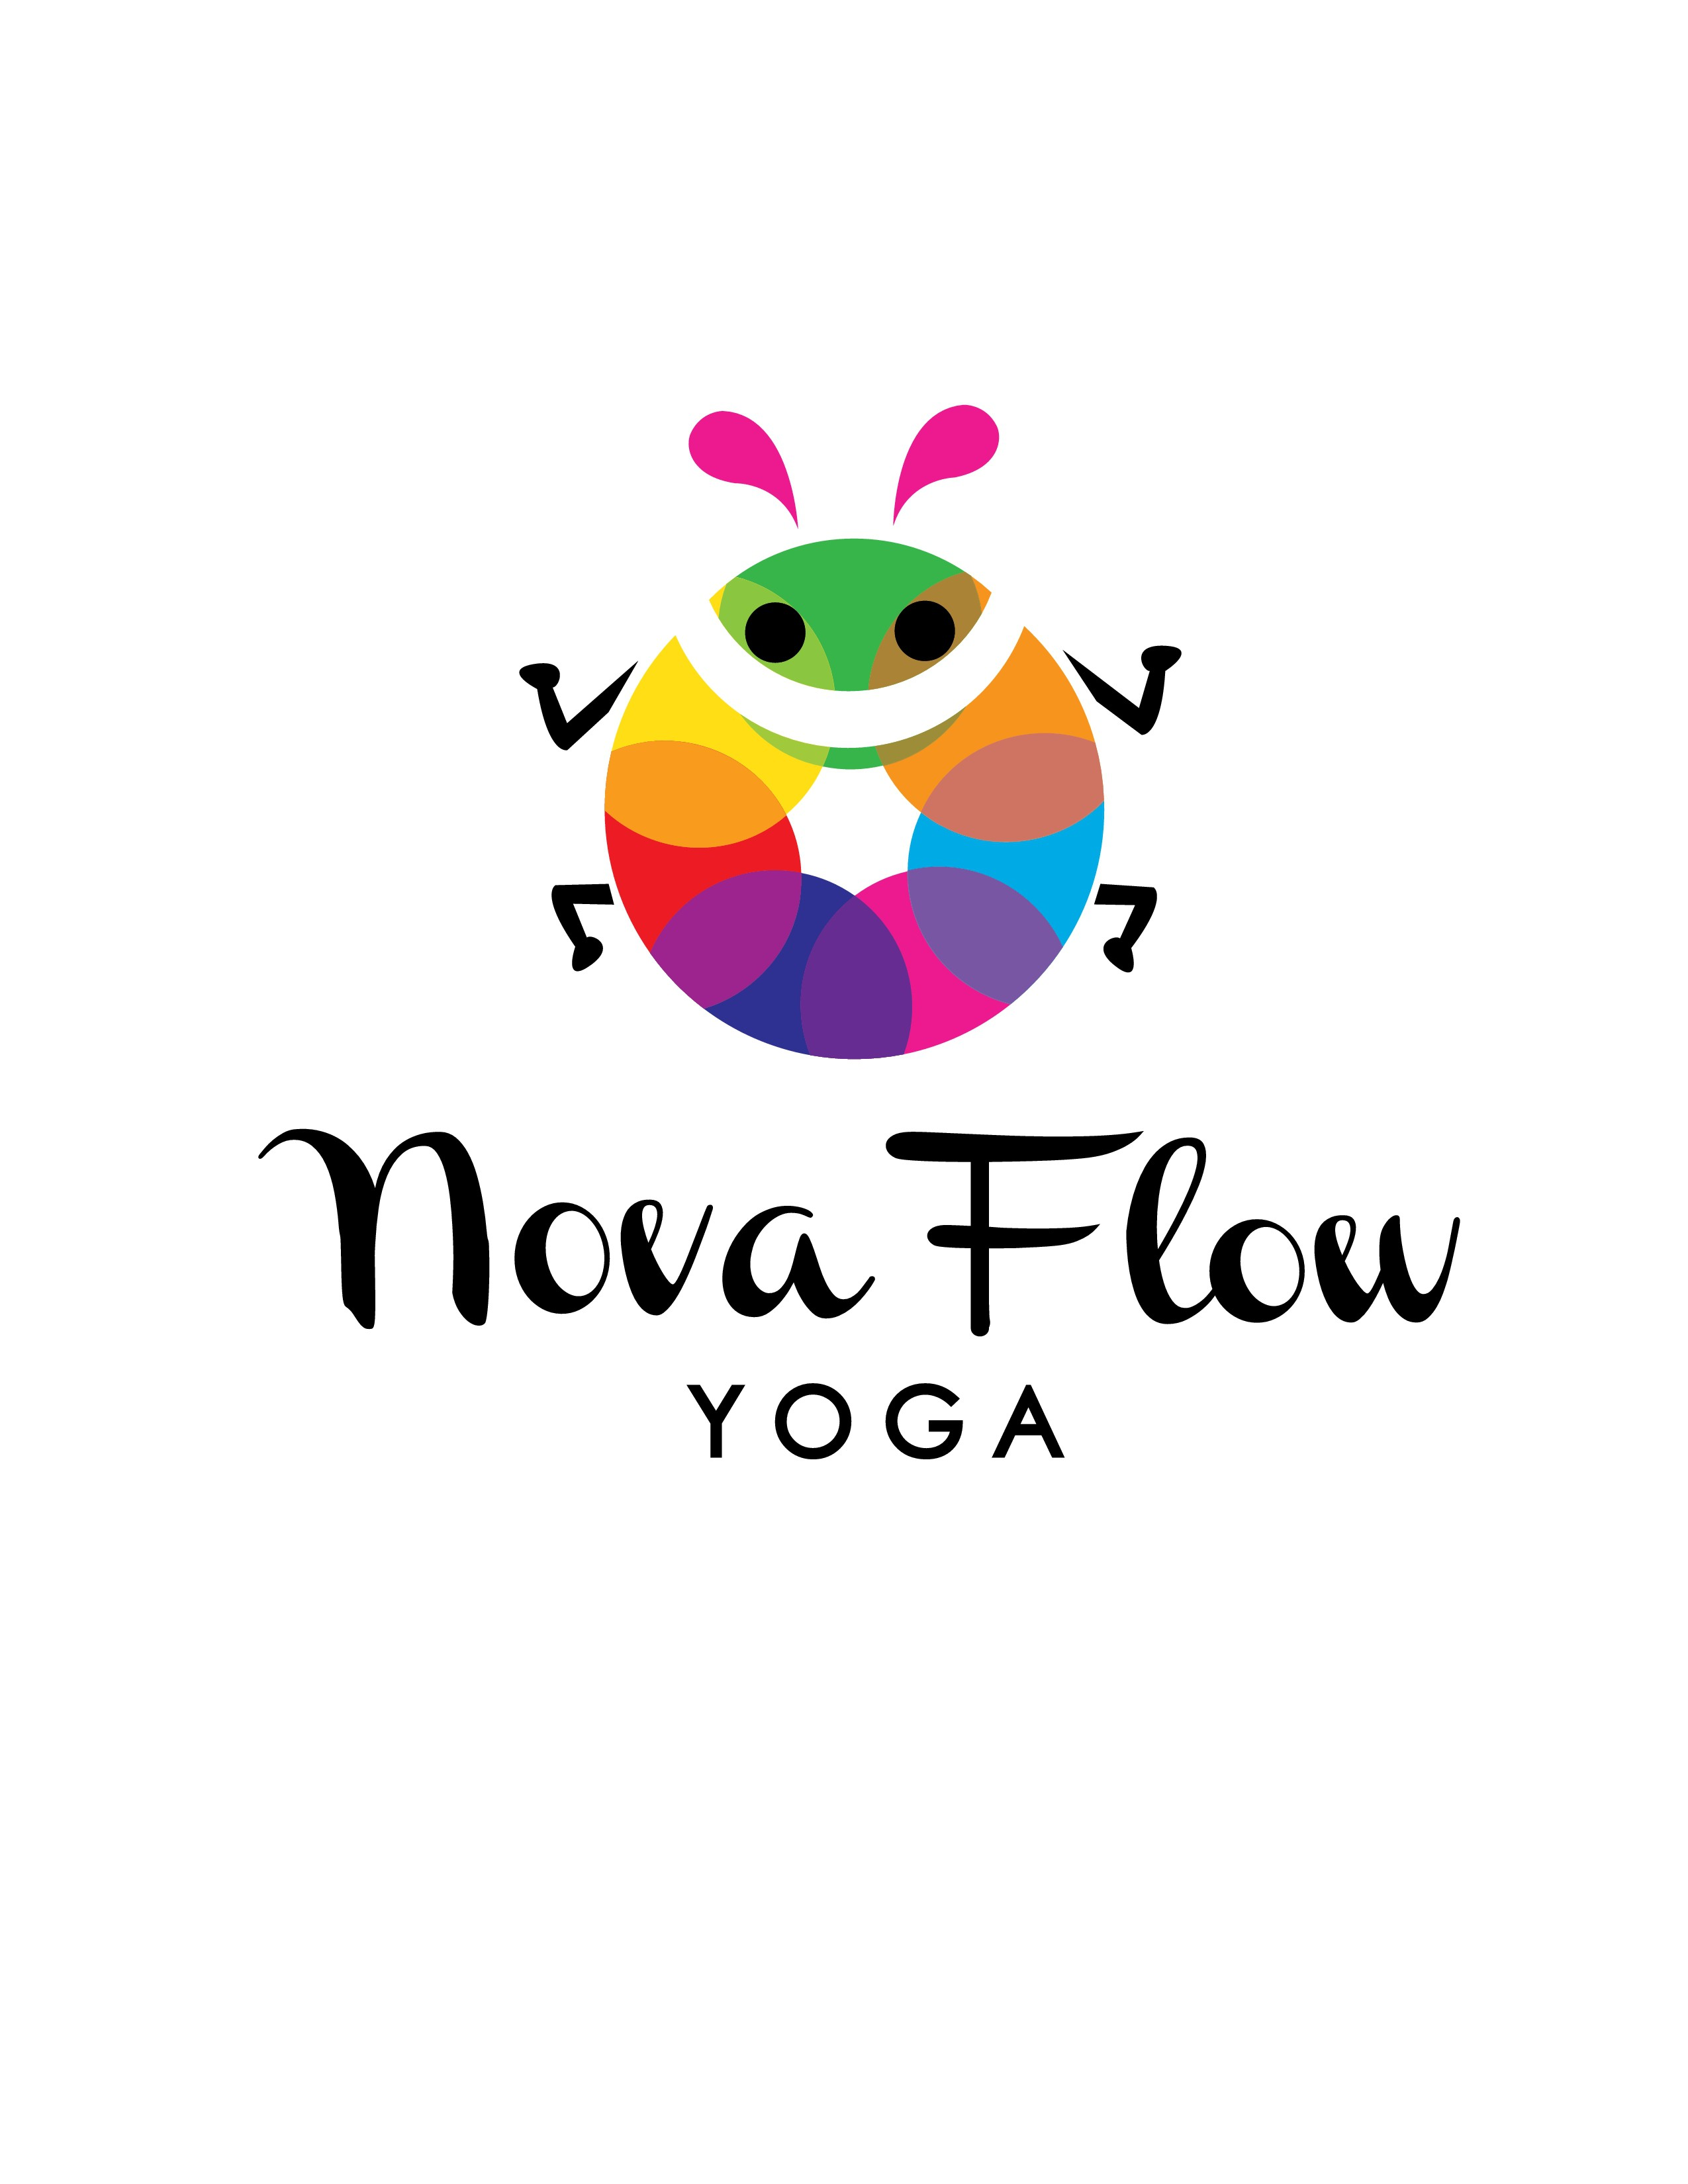 Yoga store requiring a brand establishing, peaceful, symbol